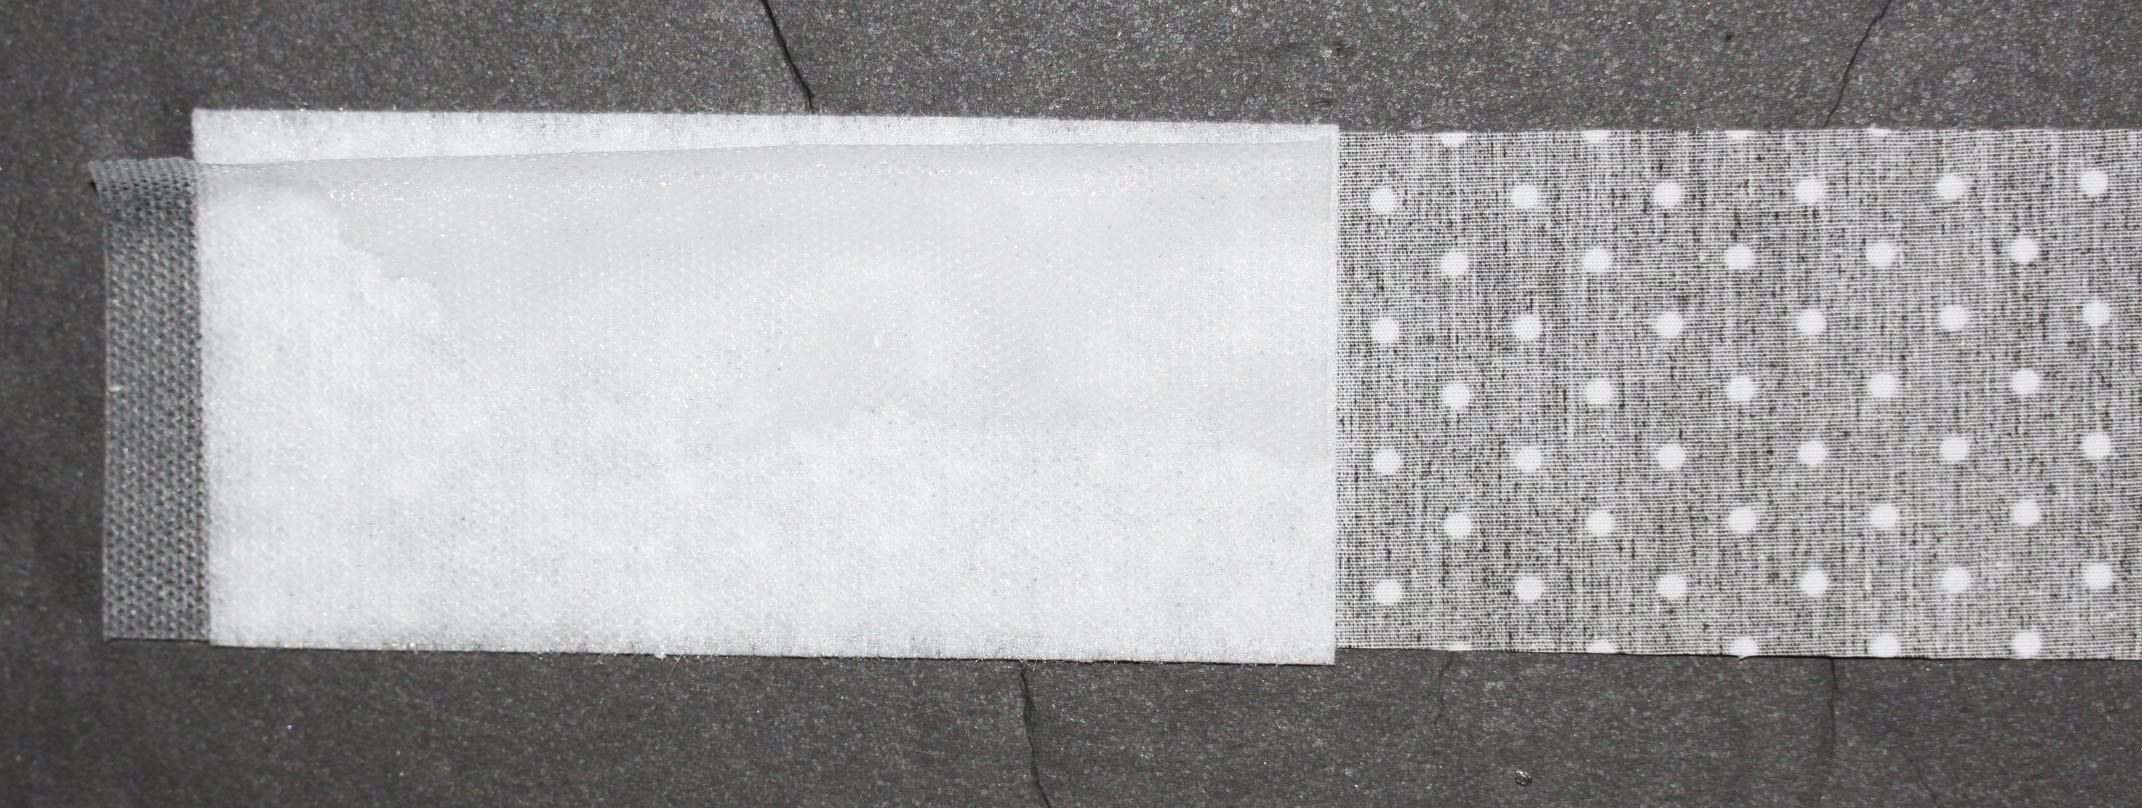 Fuseable Webbing Overlaying Fabric